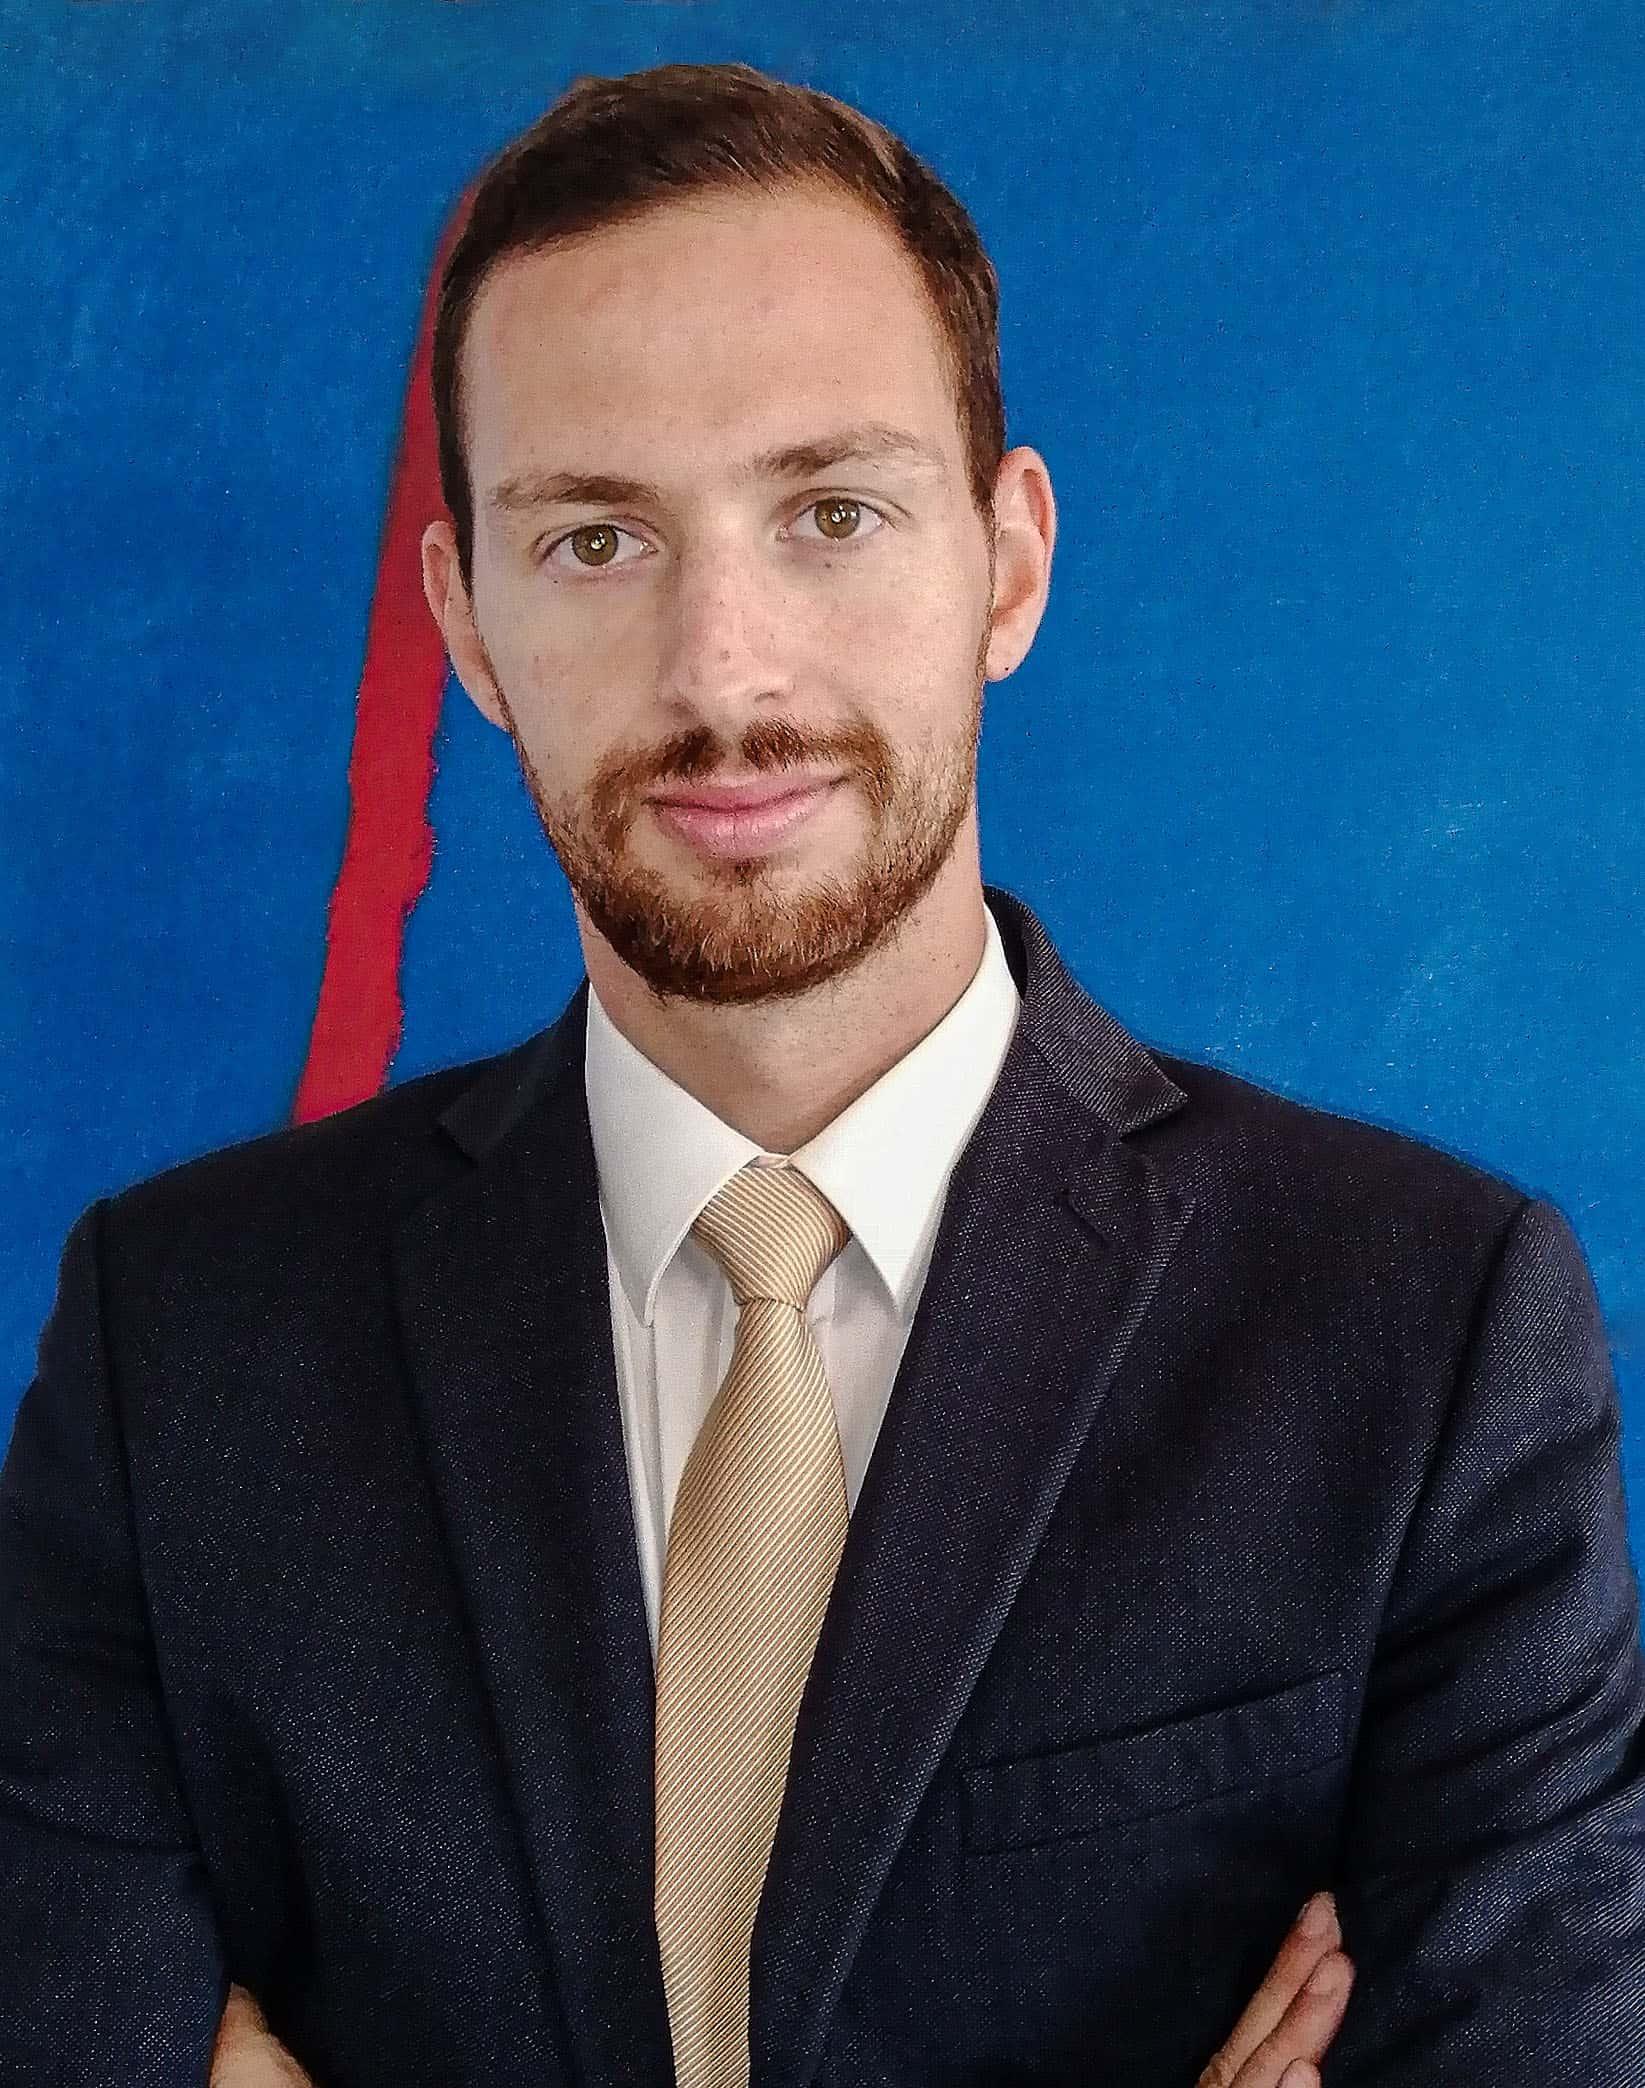 Simone Pitto